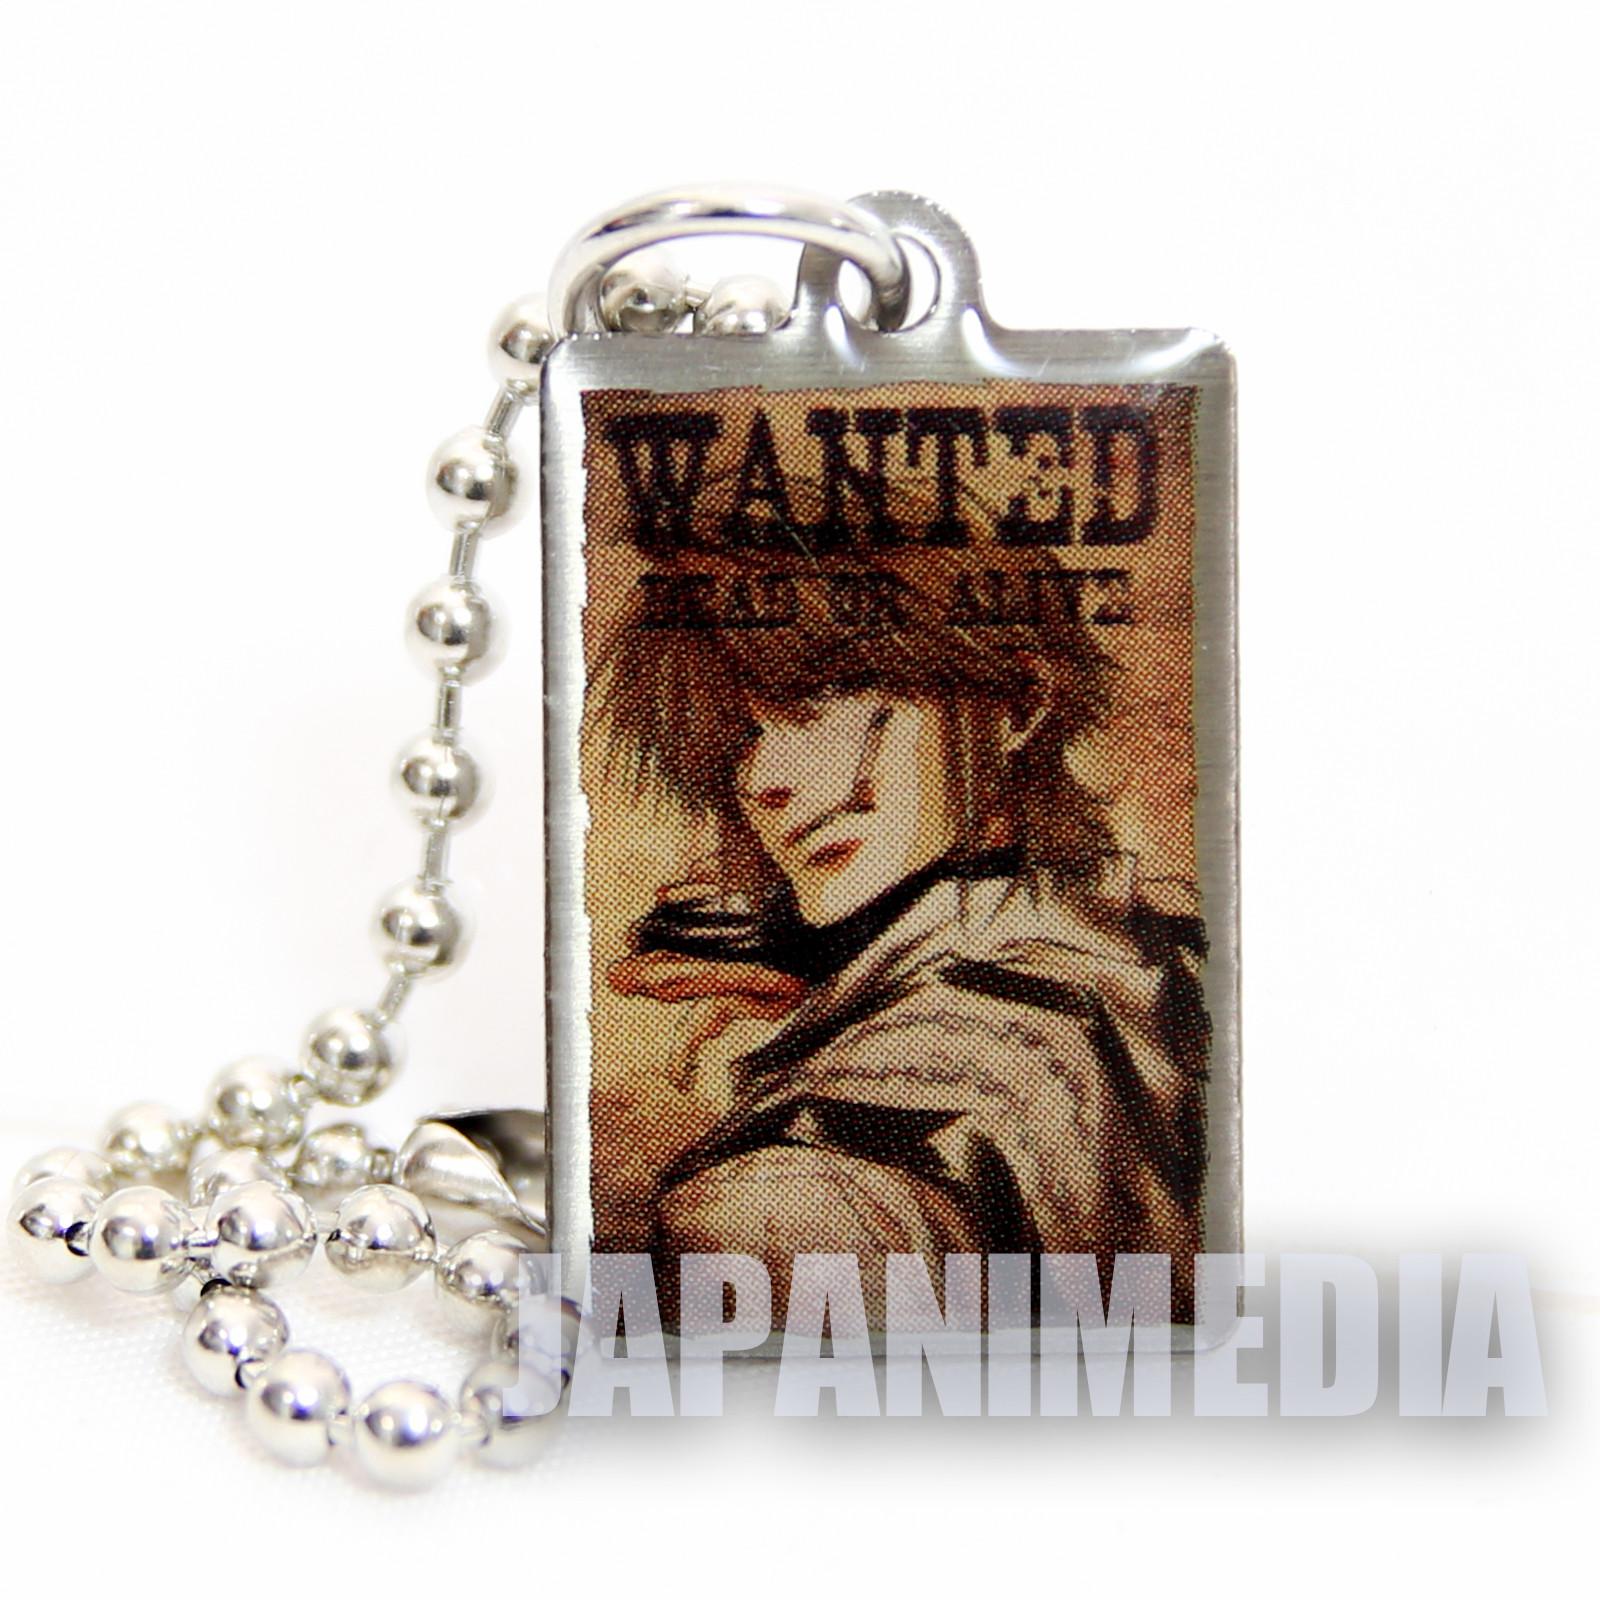 Gensomaden SAIYUKI Genjo Sanzo Small Metal Plate Ballchain JAPAN ANIME MANGA